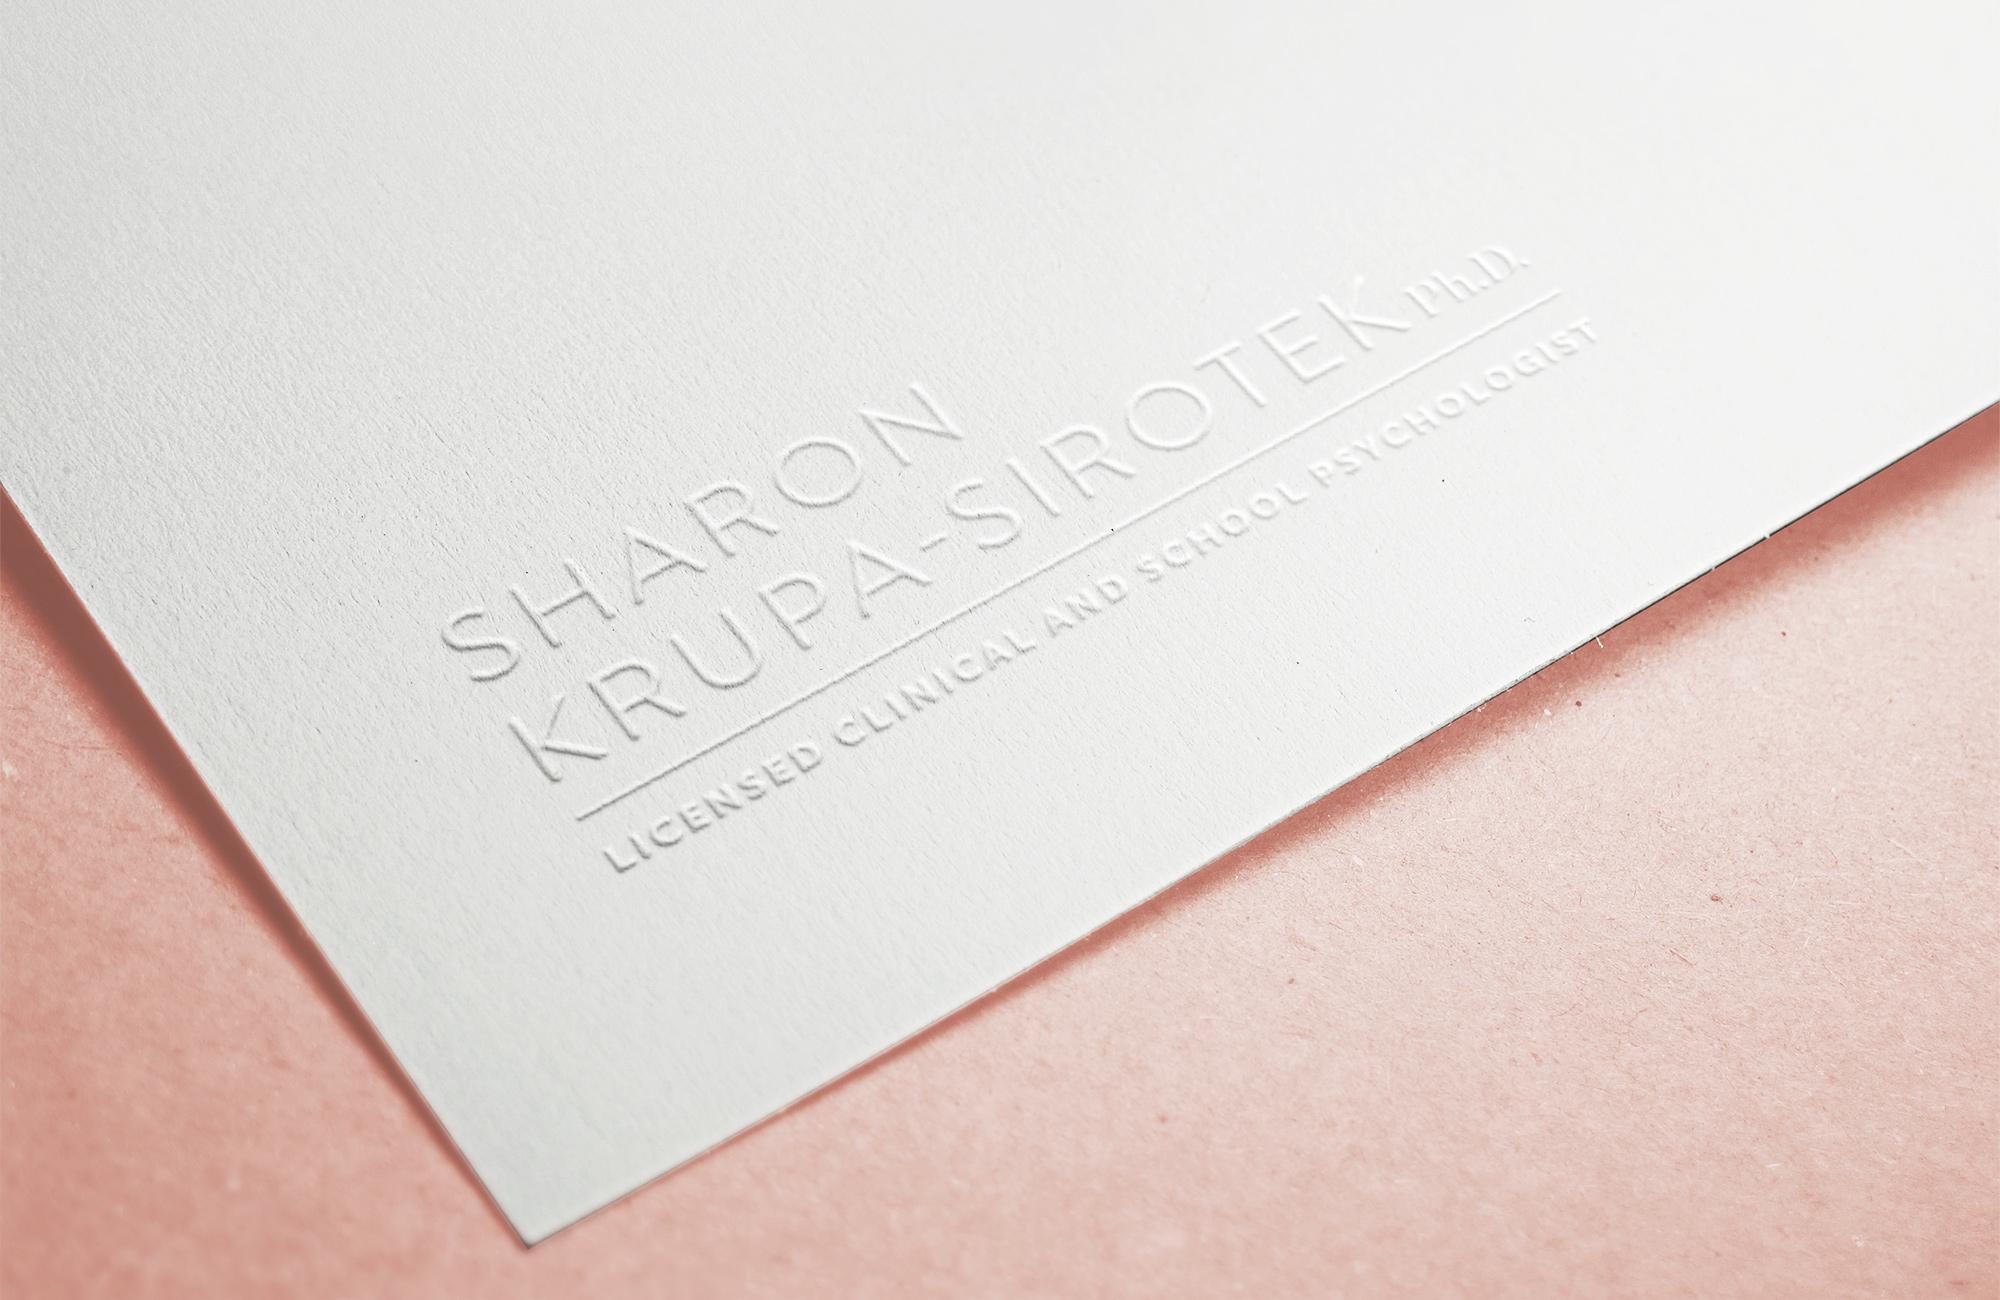 The Sharon Krupa-Sirotek logo embossed on nice paper